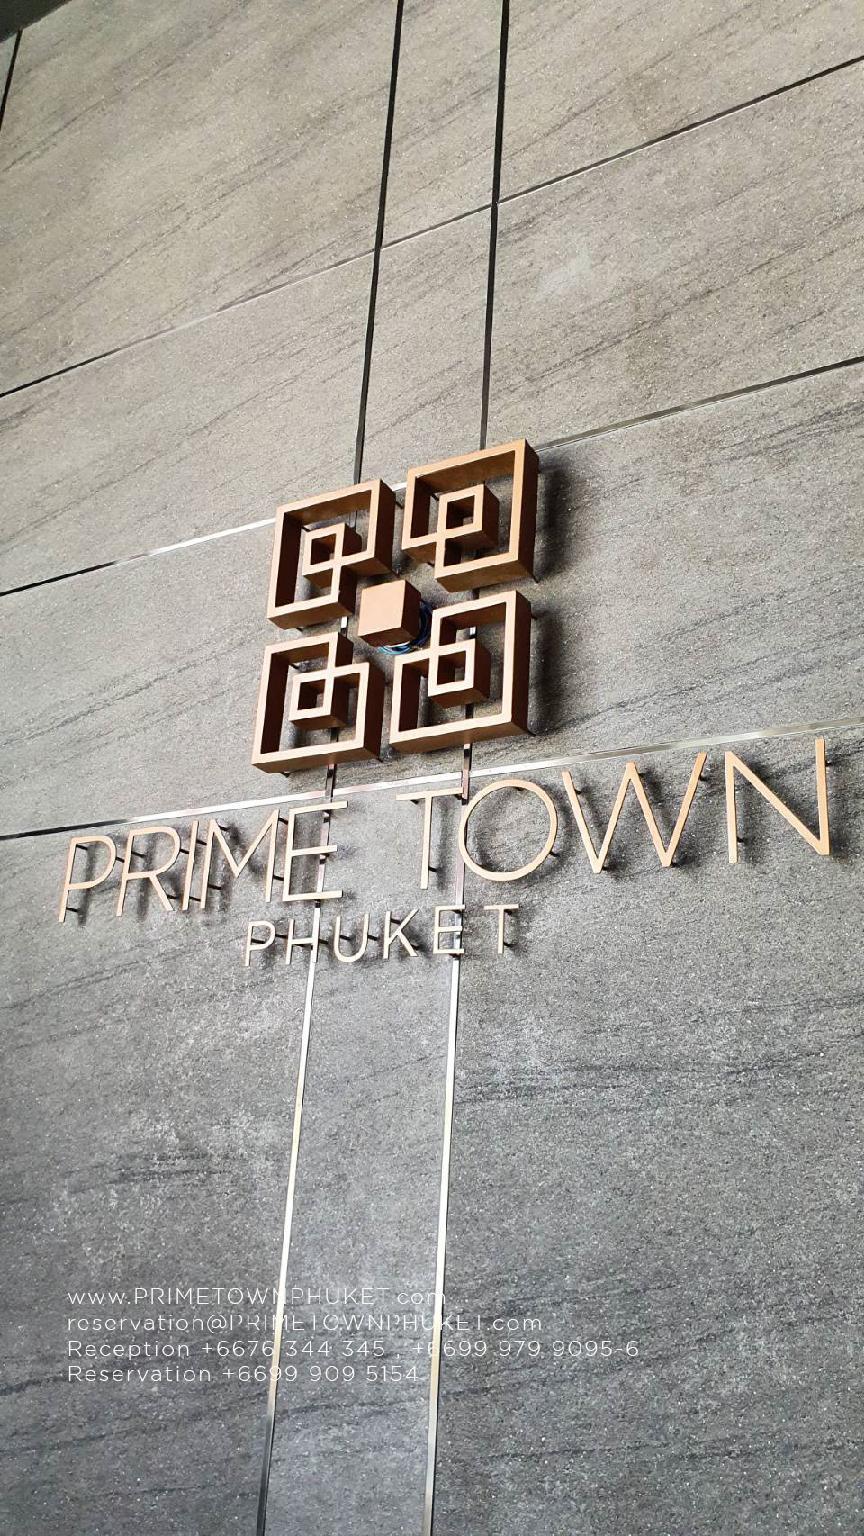 PRIME TOWN - Posh & Port Hotel PHUKET ไพรม์ ทาวน์ - ฮับ แอนด์ โฮเต็ล ภูเก็ต